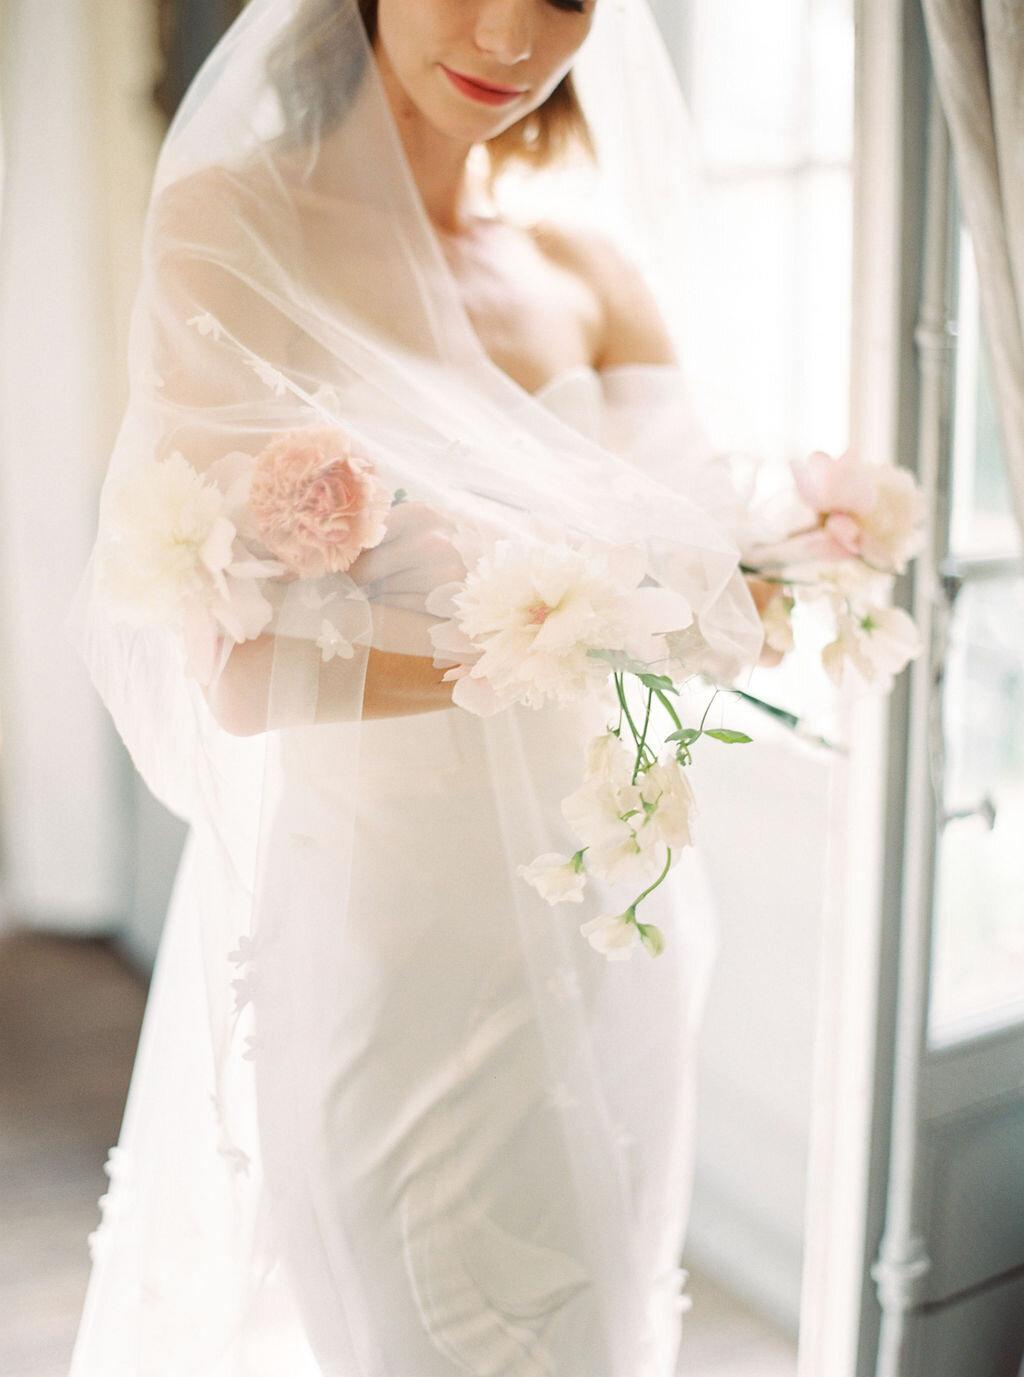 Wedding_Veil_Madame_Tulle_Amelia_Soegijono0146.JPG